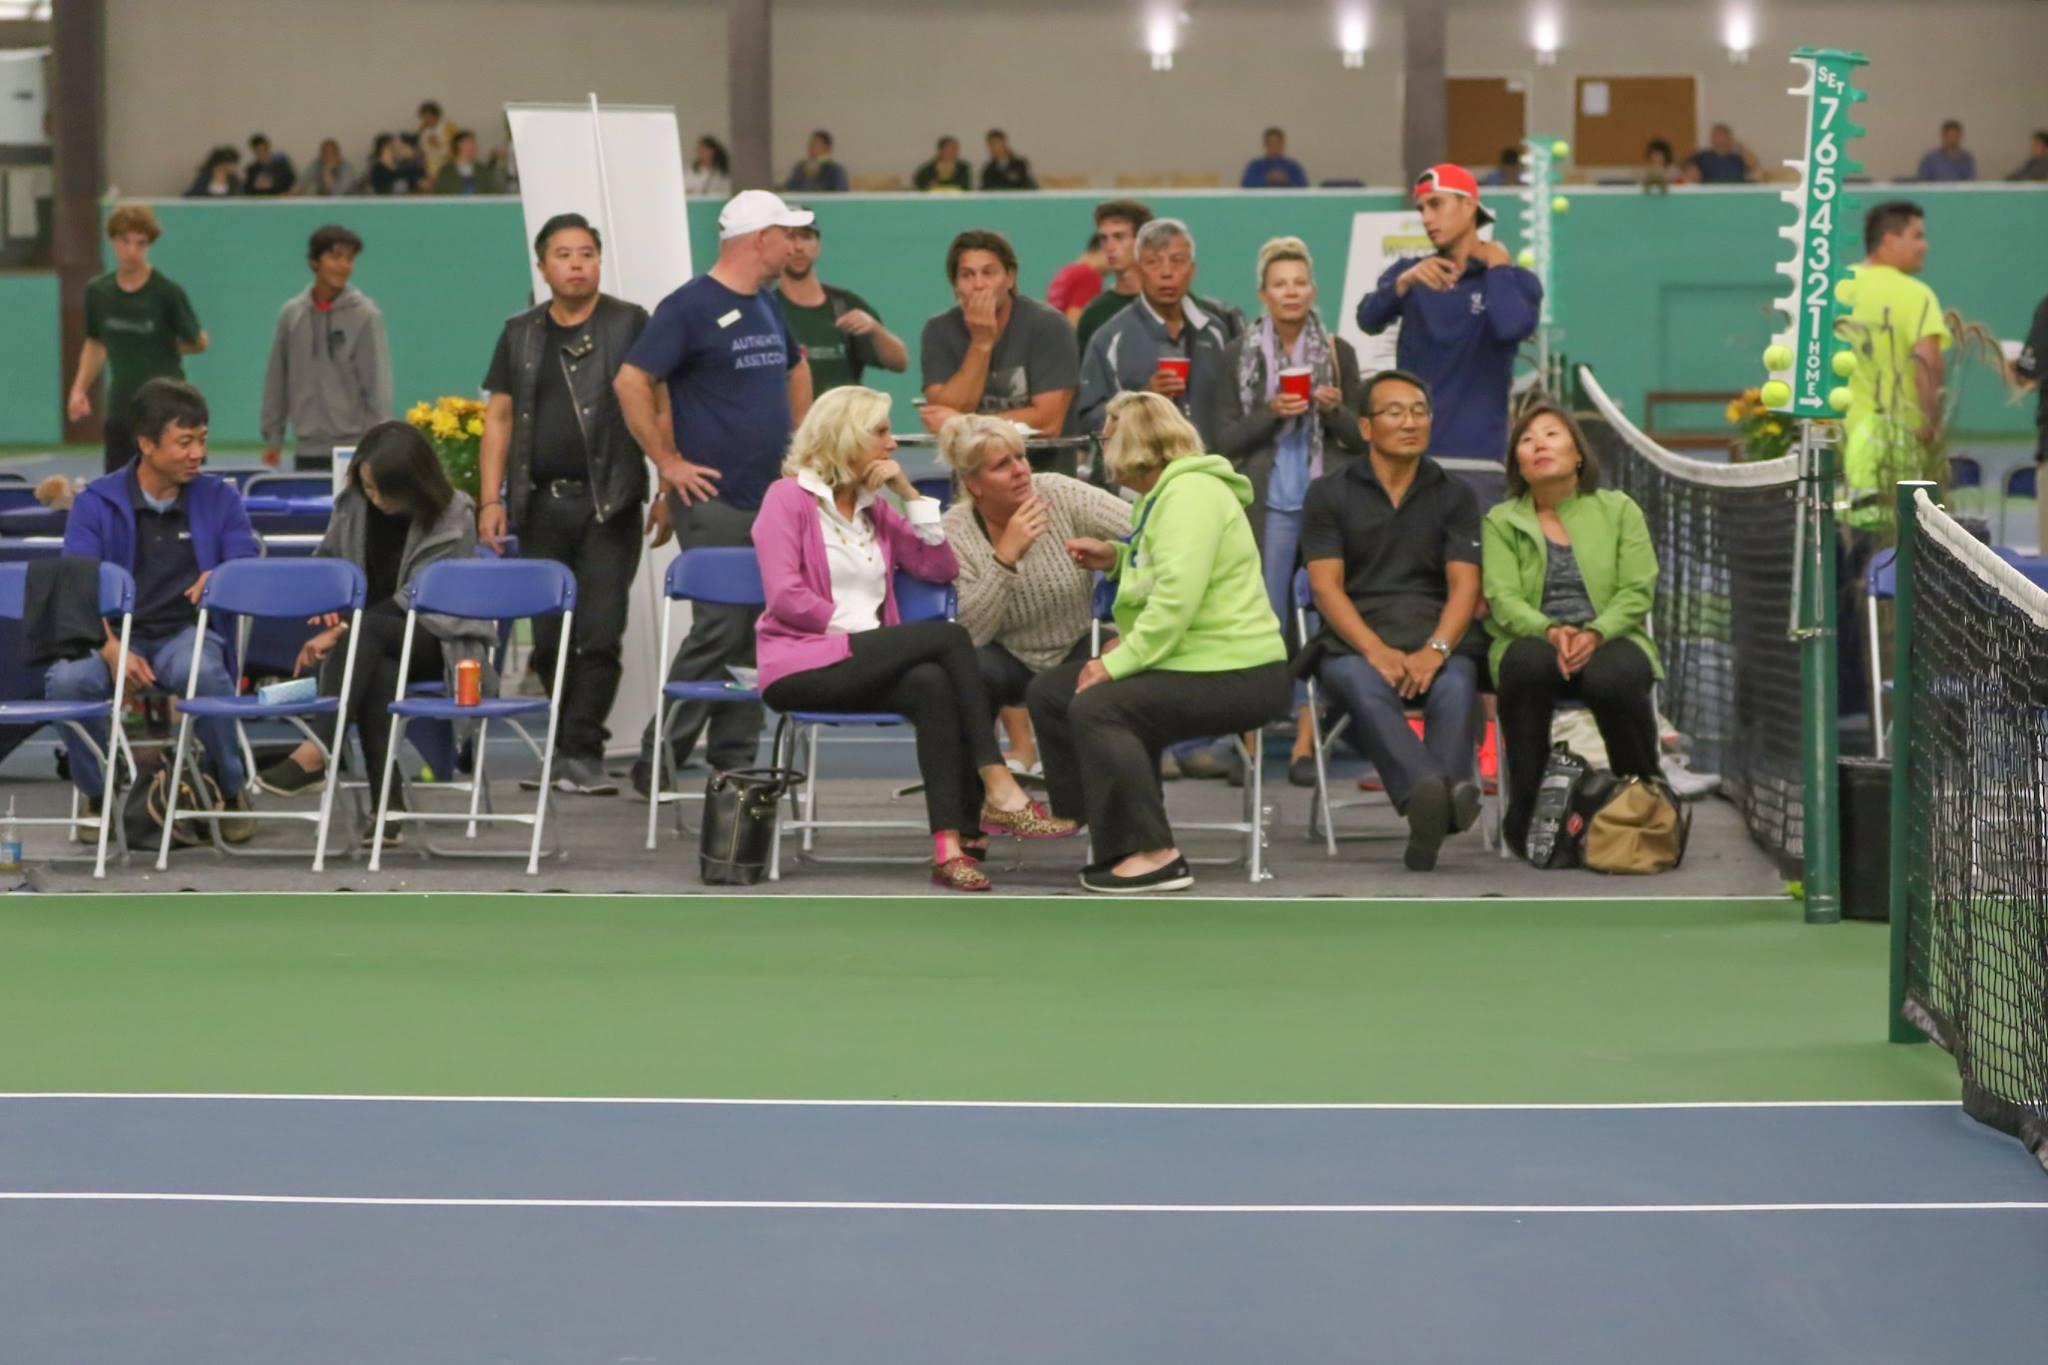 Spectators watch Tennis at Mayfair East